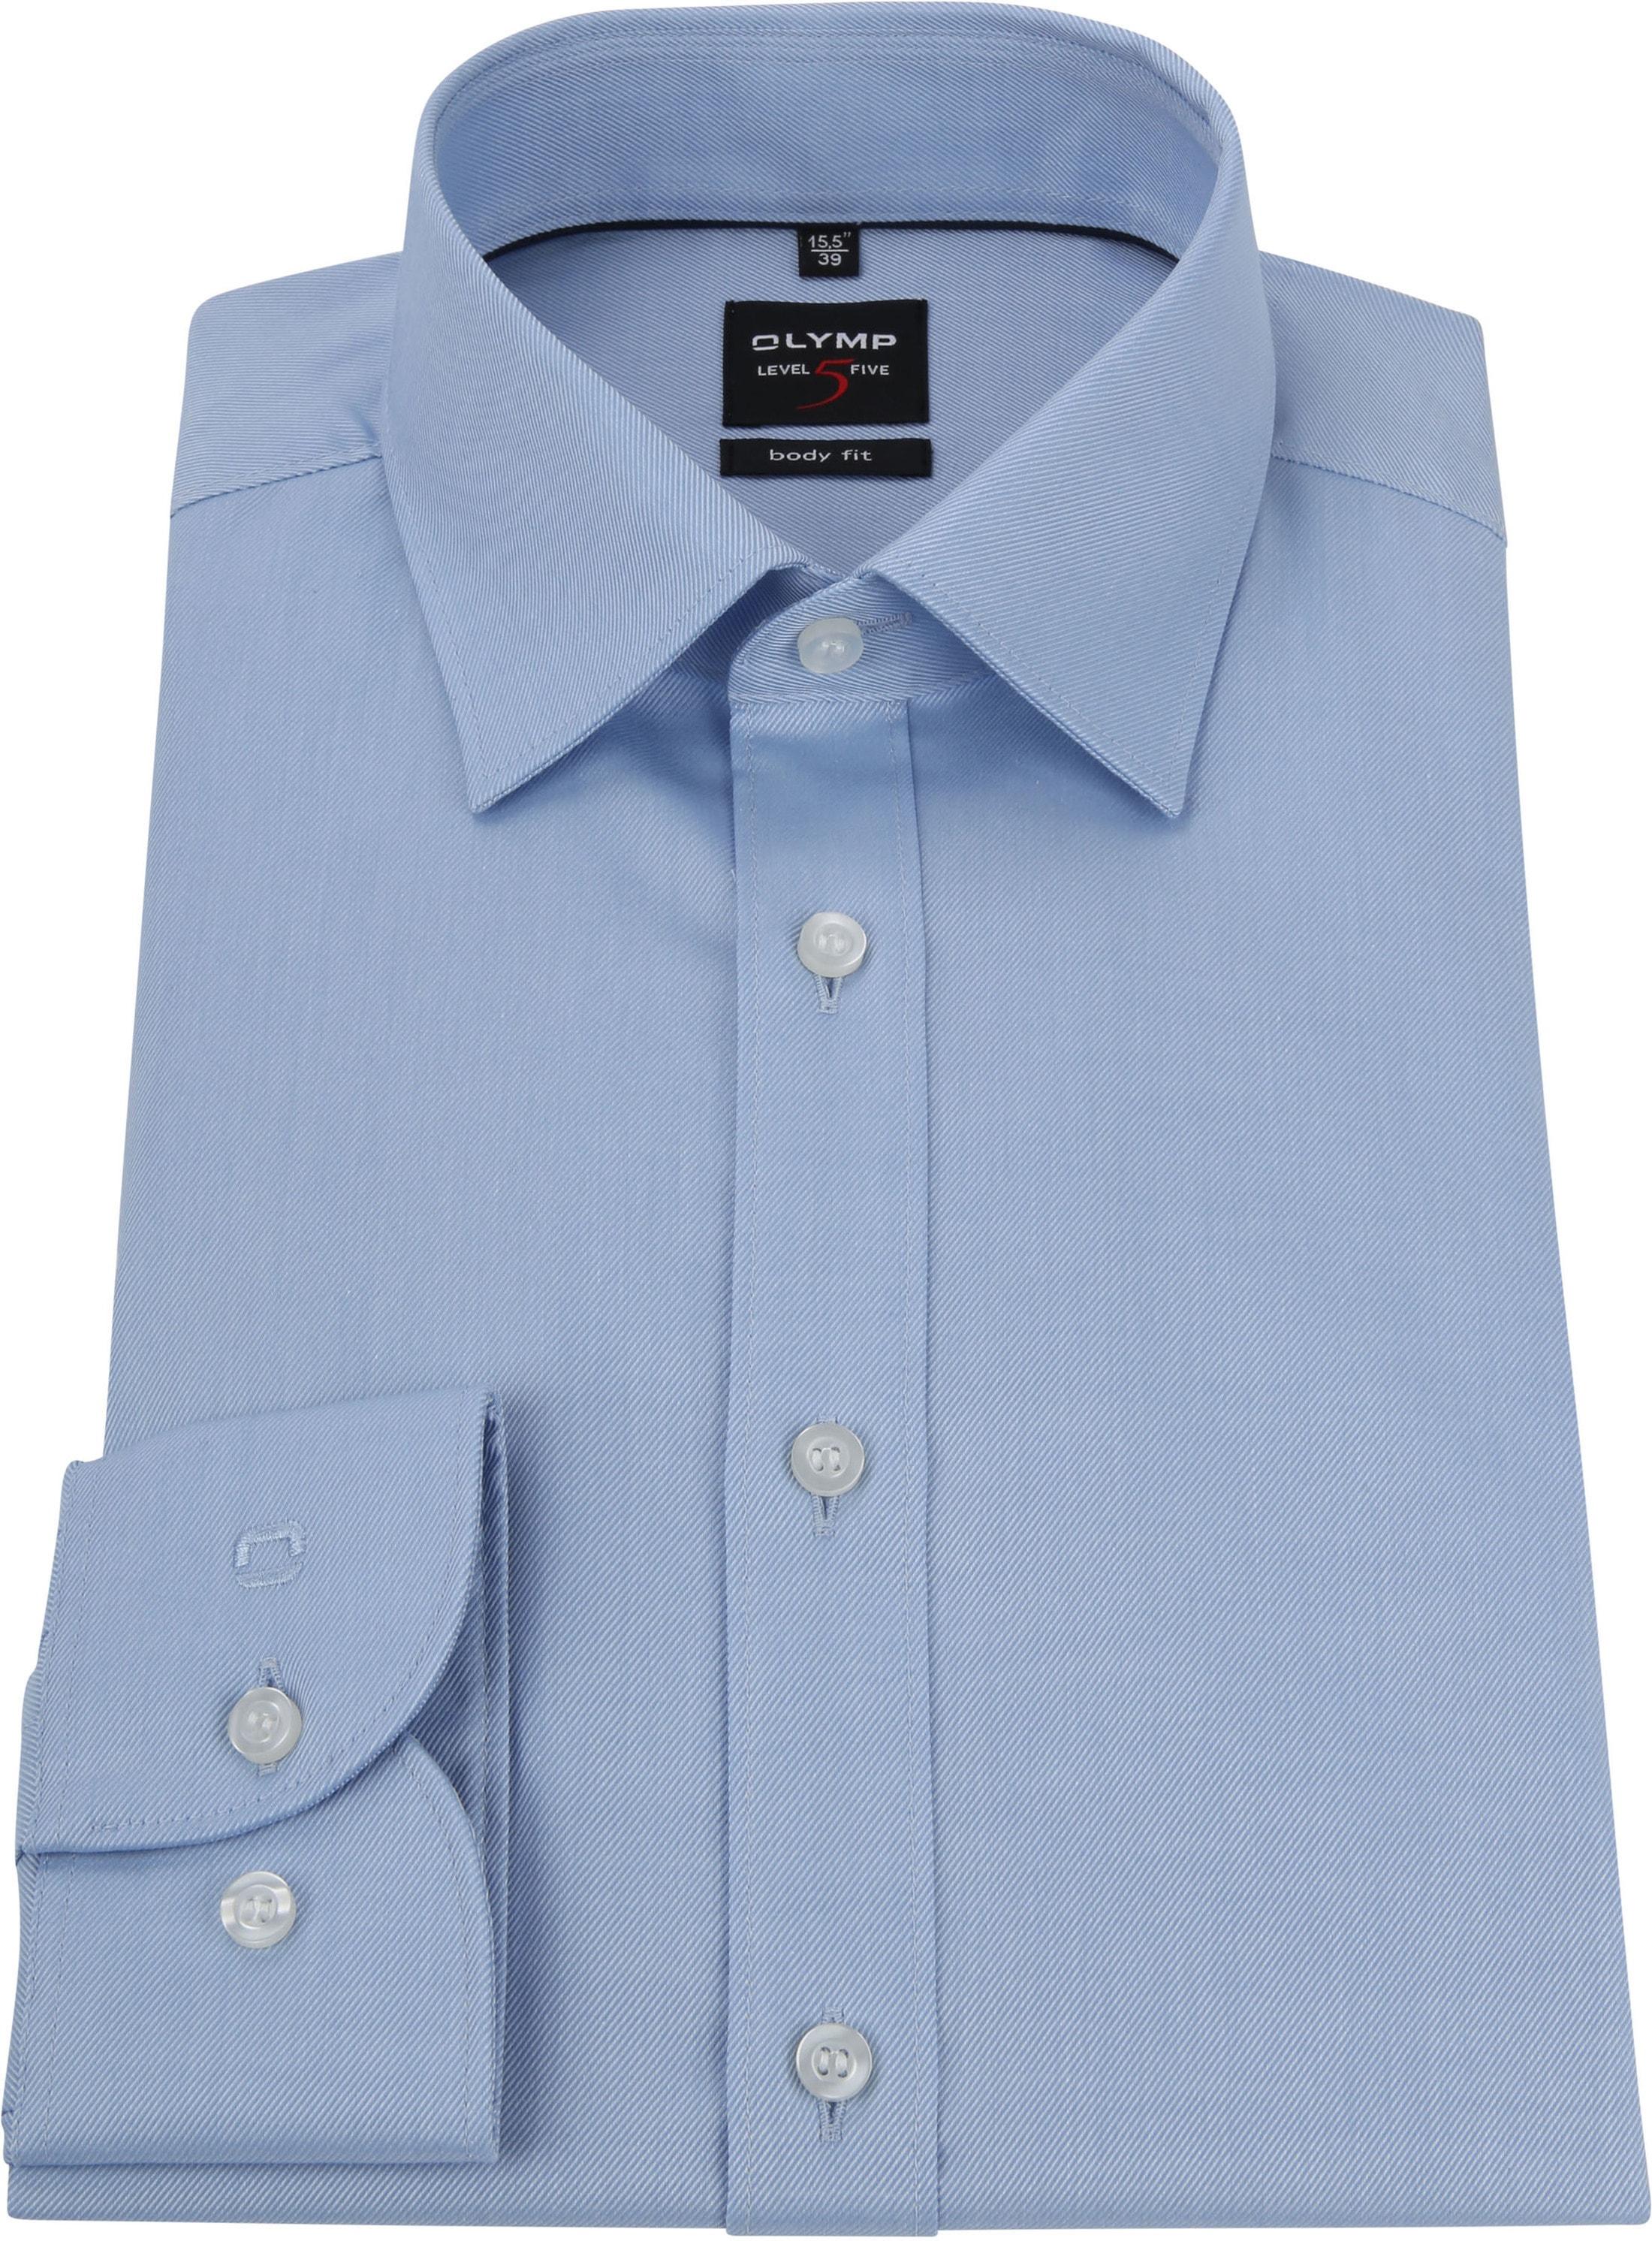 OLYMP Overhemd Level 5 Twill Blauw foto 2